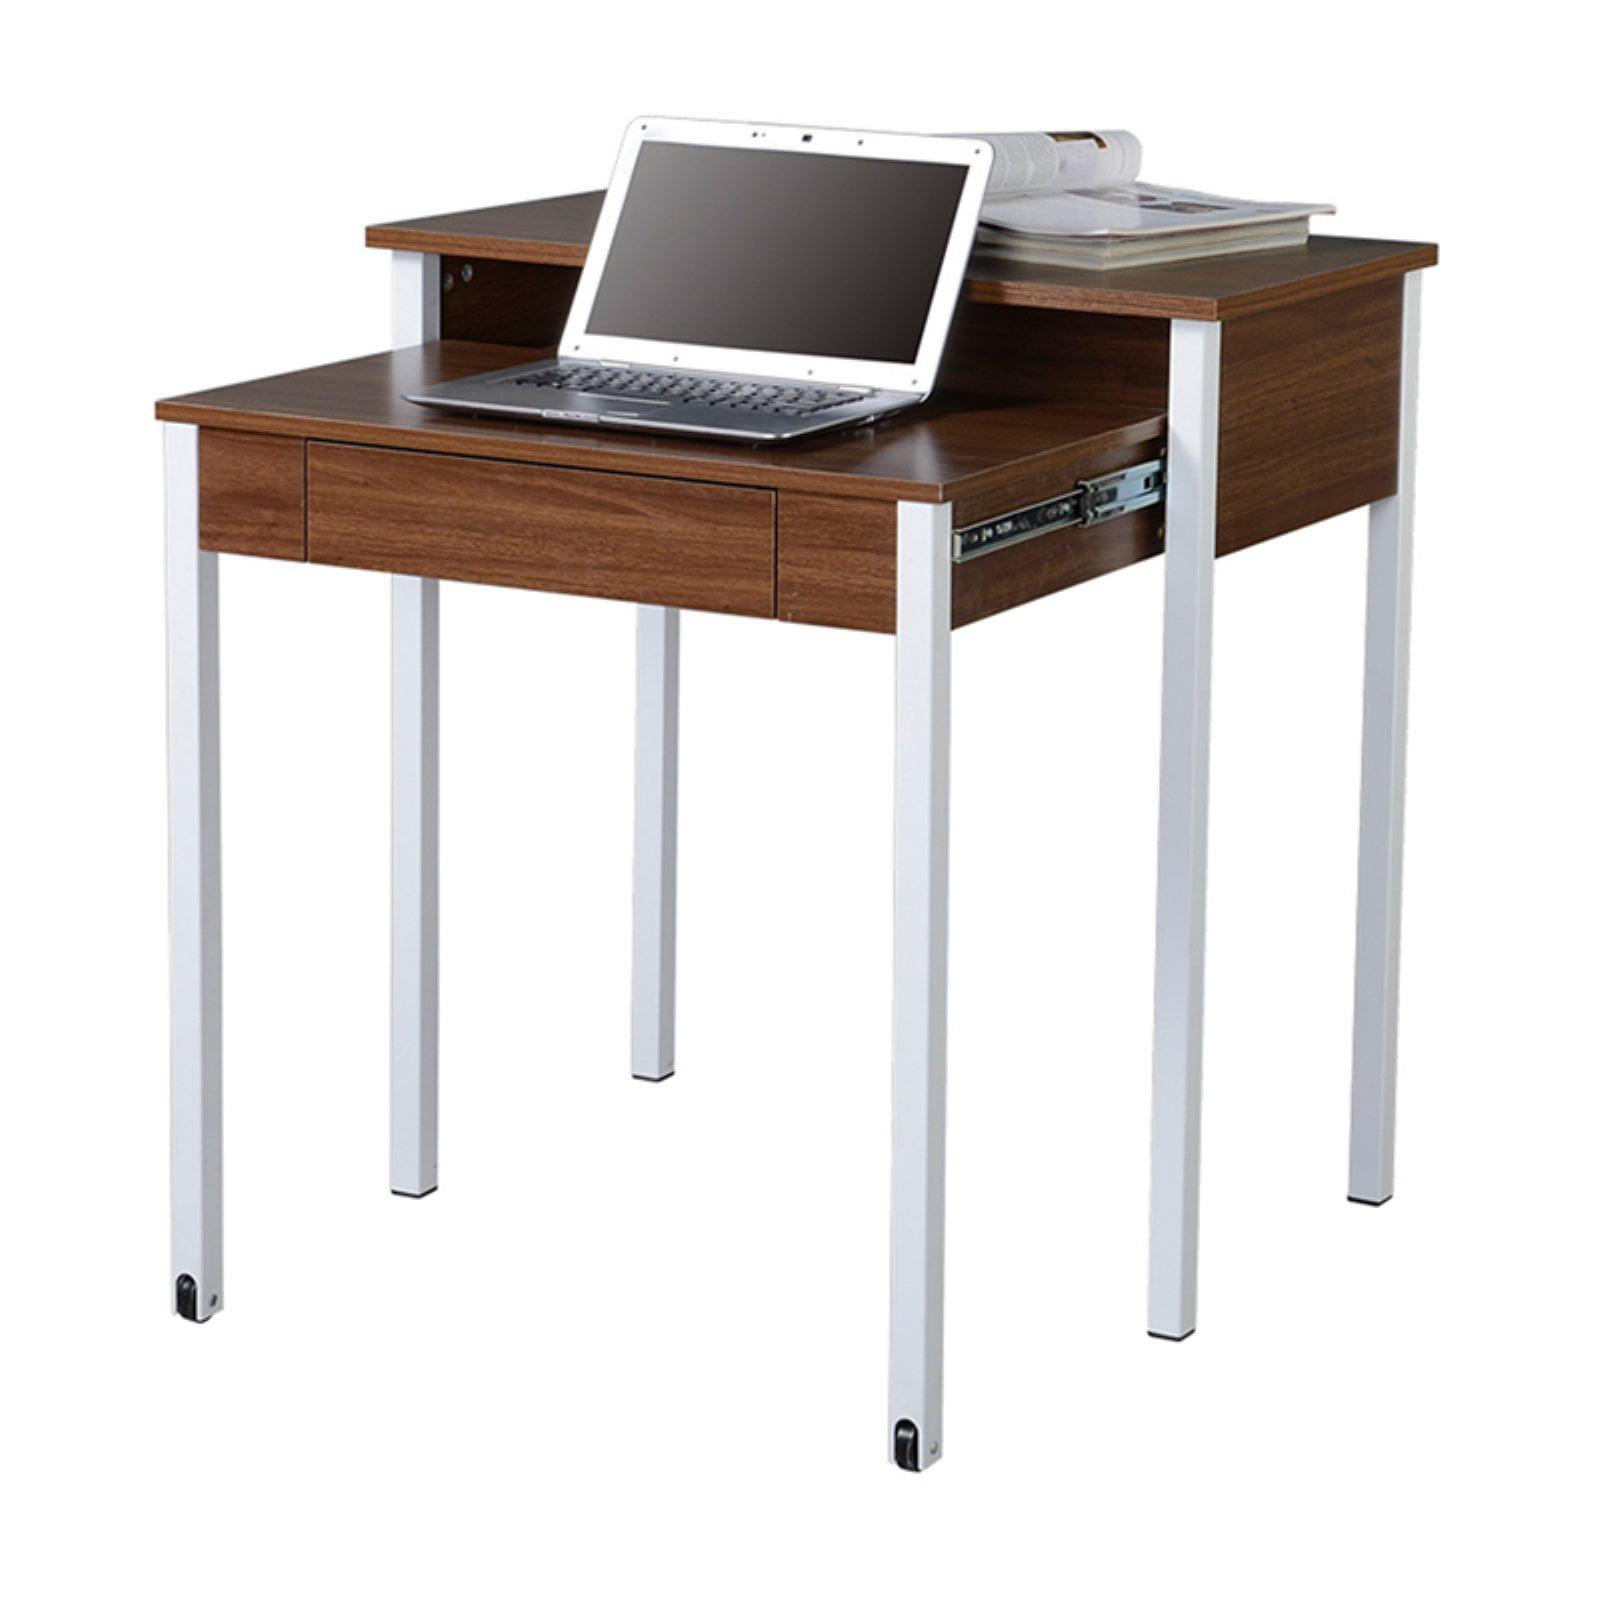 Techni Mobili Retractable Writing Desk with Storage, Walnut (RTA-1459-WAL)